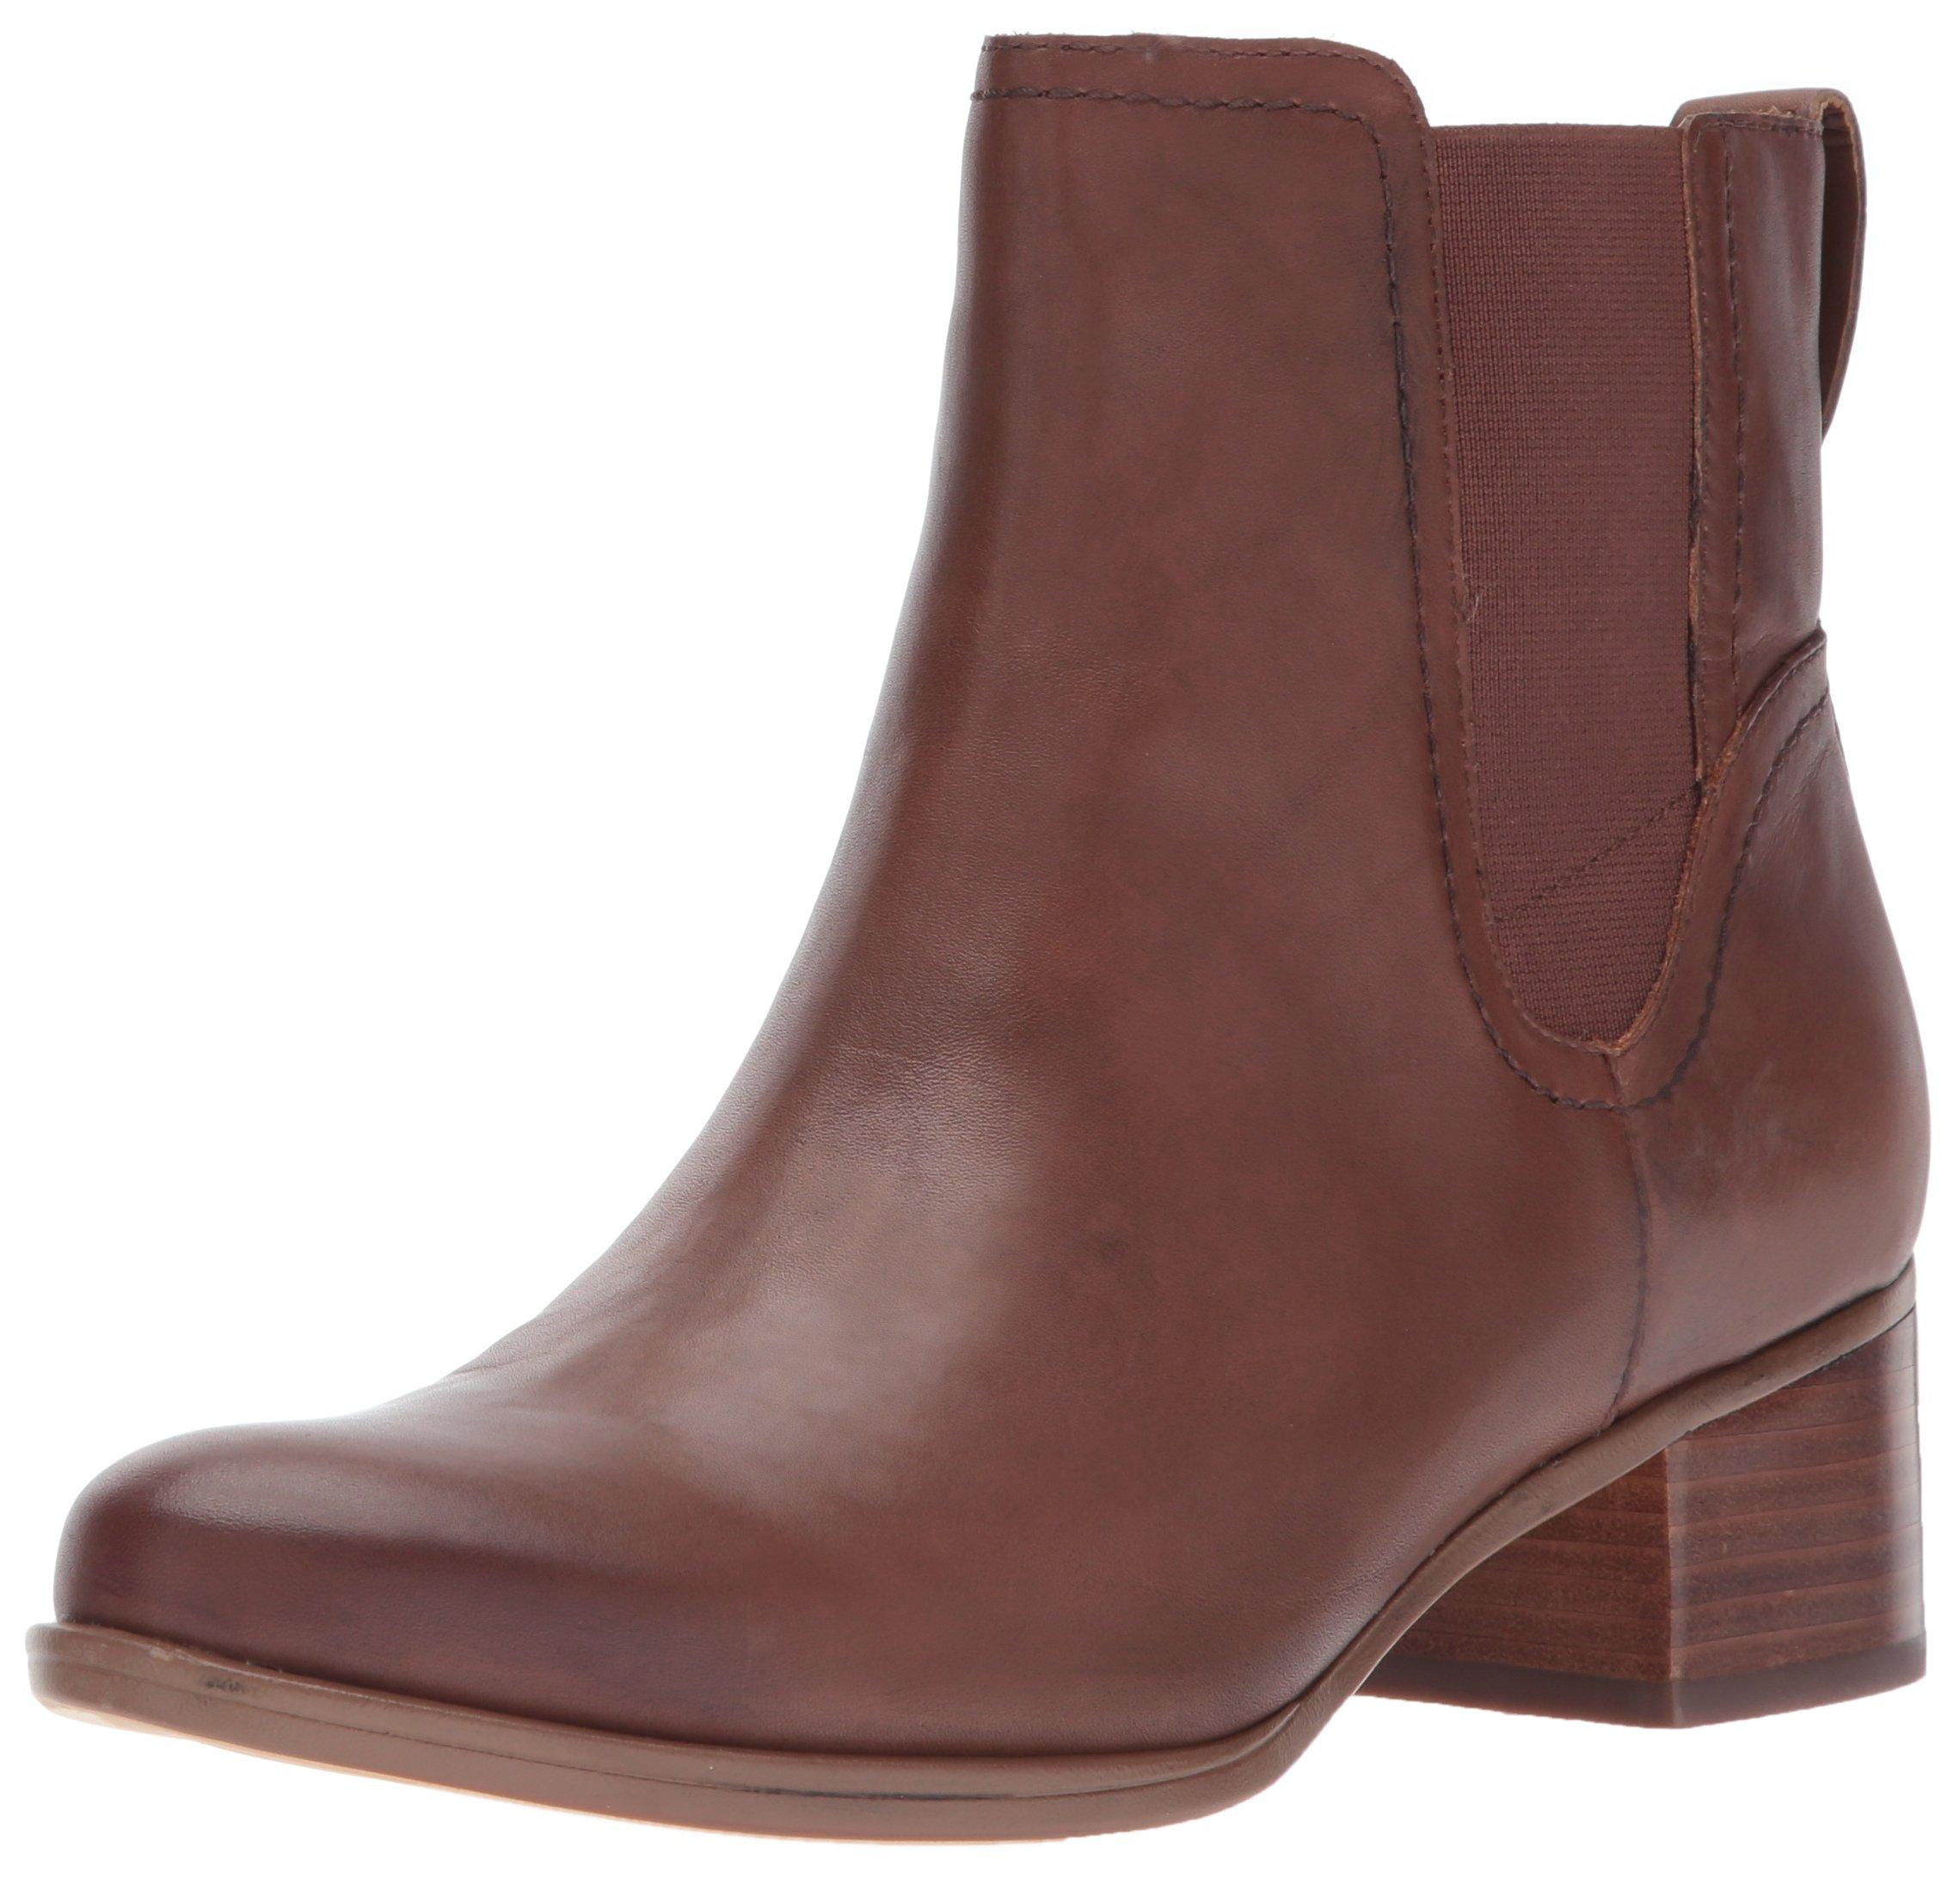 Naturalizer Women's Dallas Ankle Bootie, Coffee Bean, 8 W US